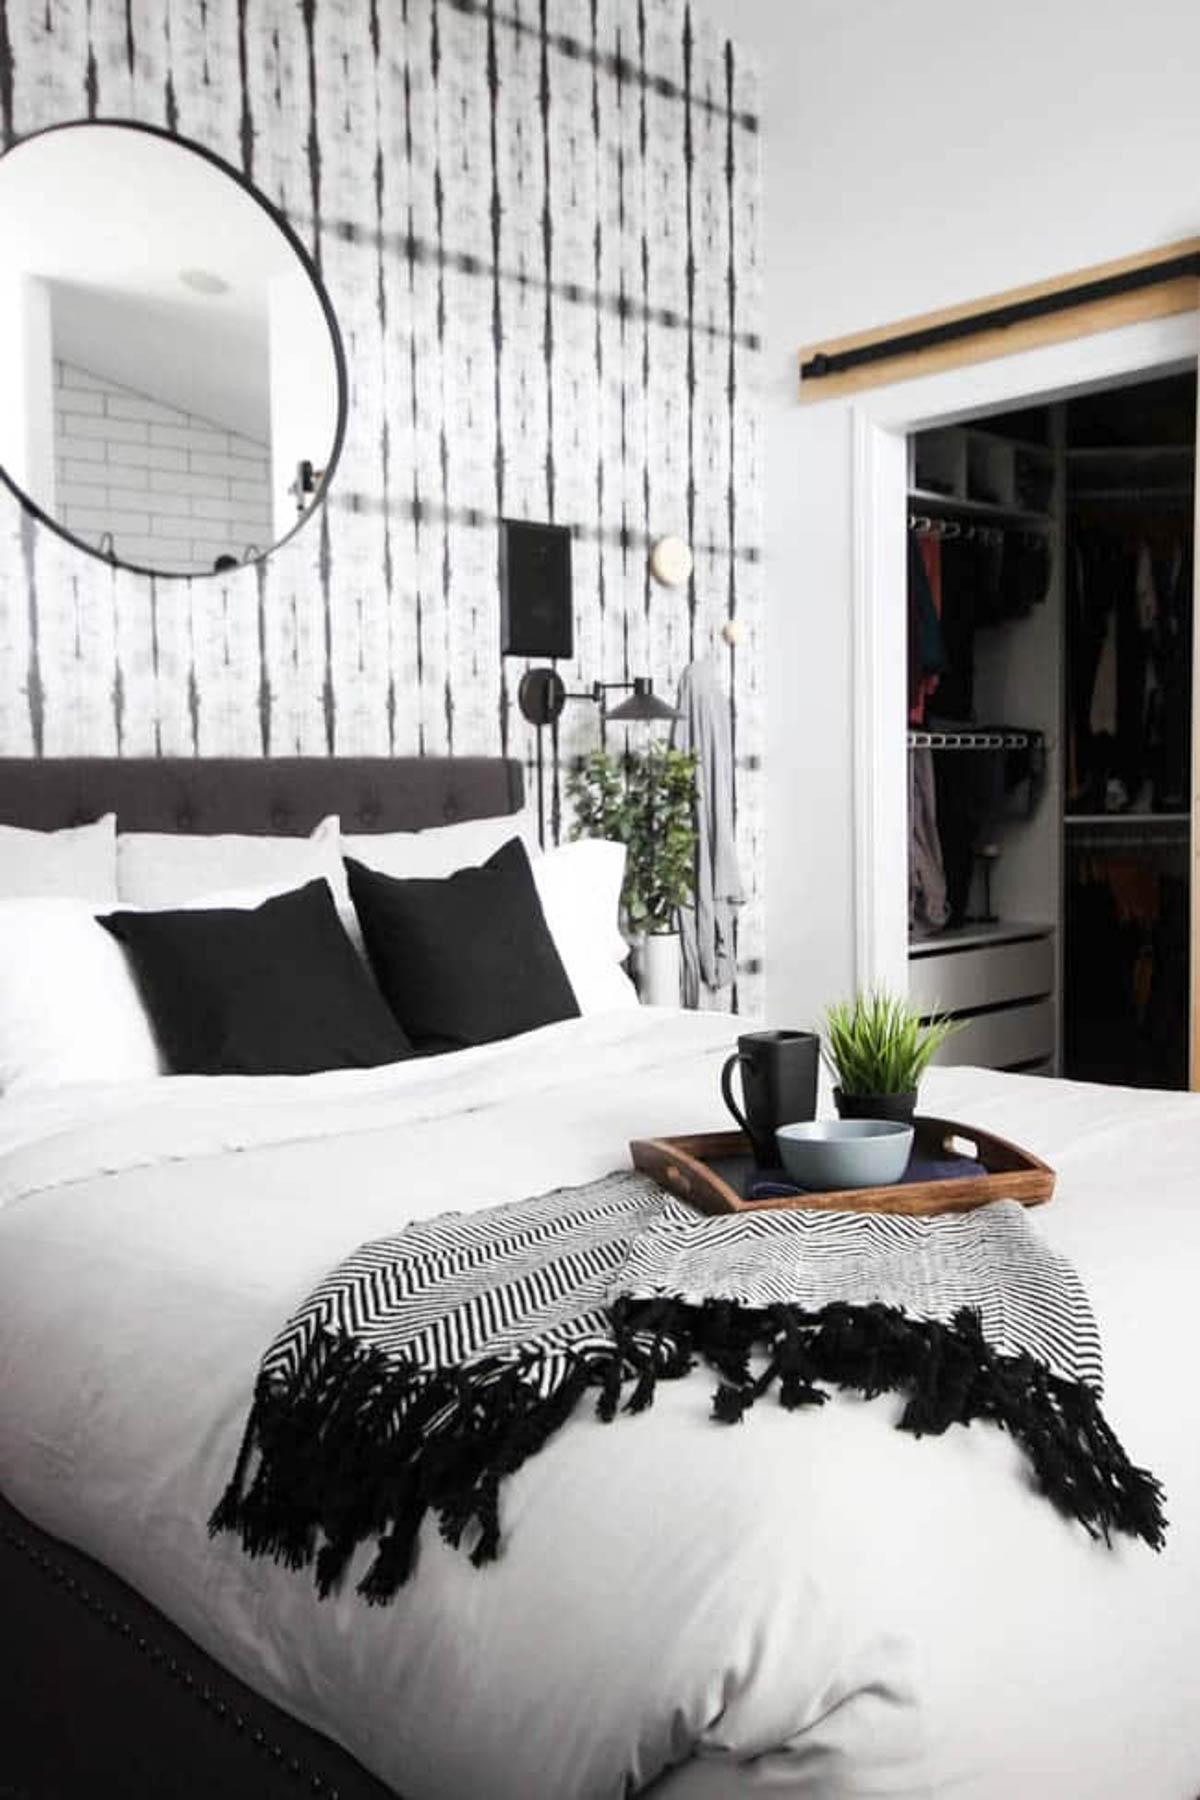 DIY wall hooks hanging in a bedroom